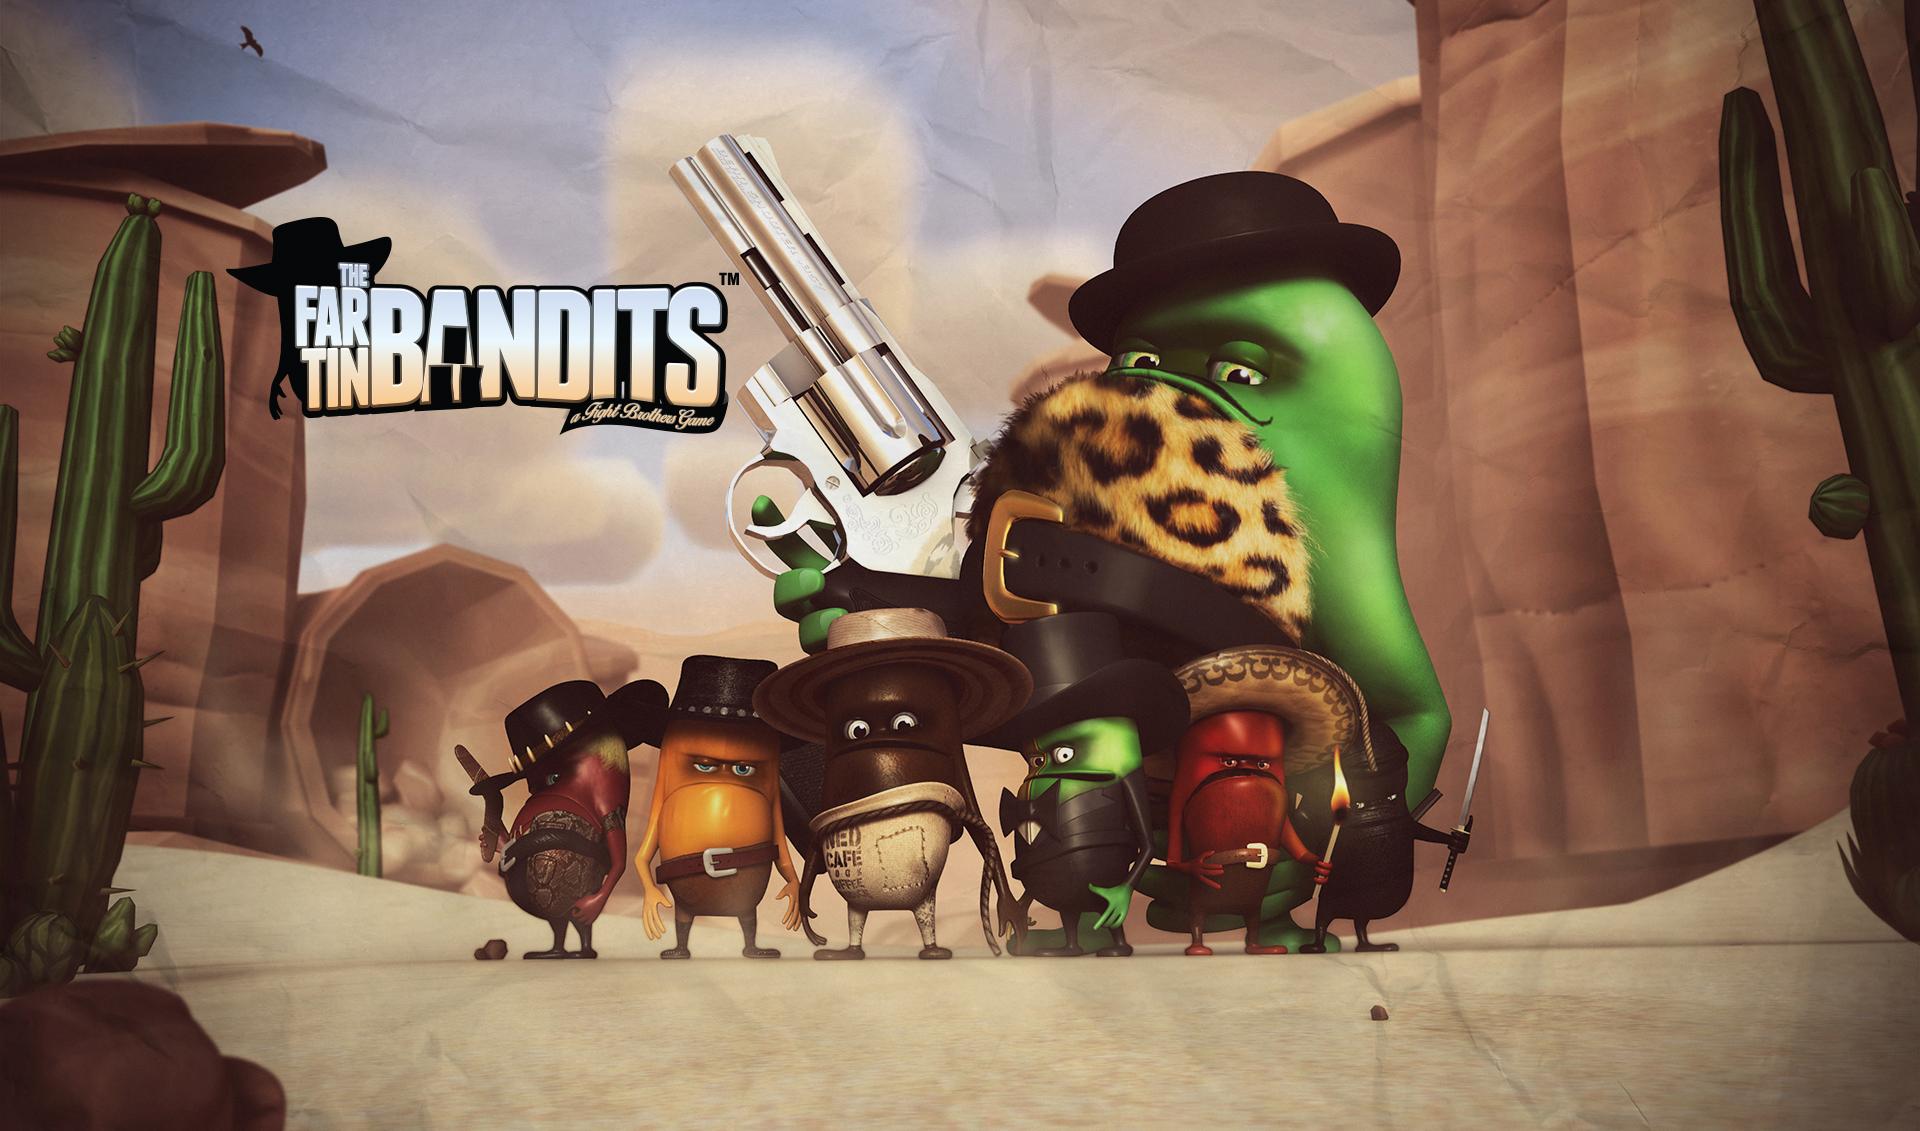 The Far Tin Bandits